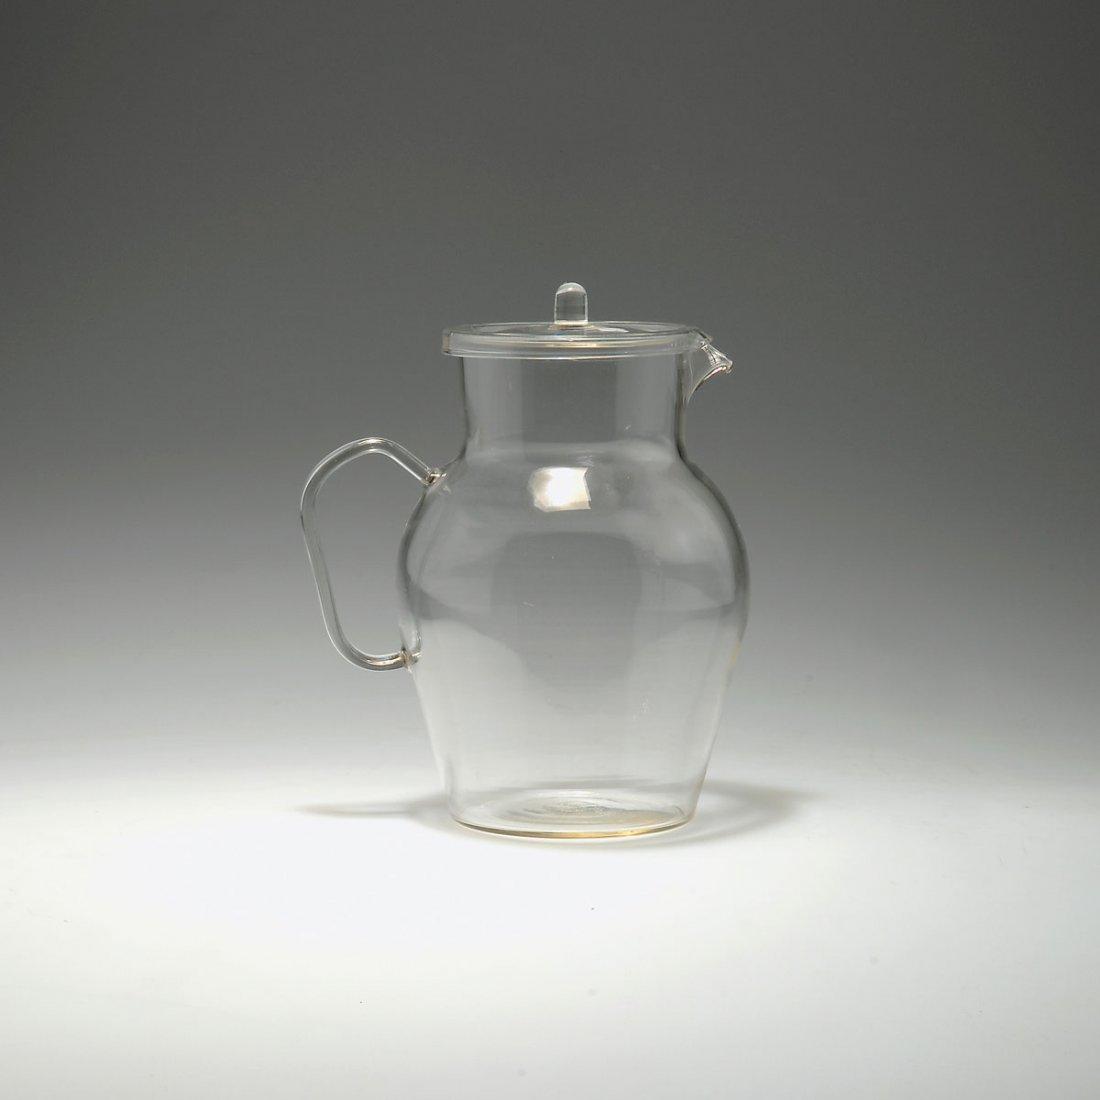 Wilhelm Wagenfeld. Lemonade jug with lid